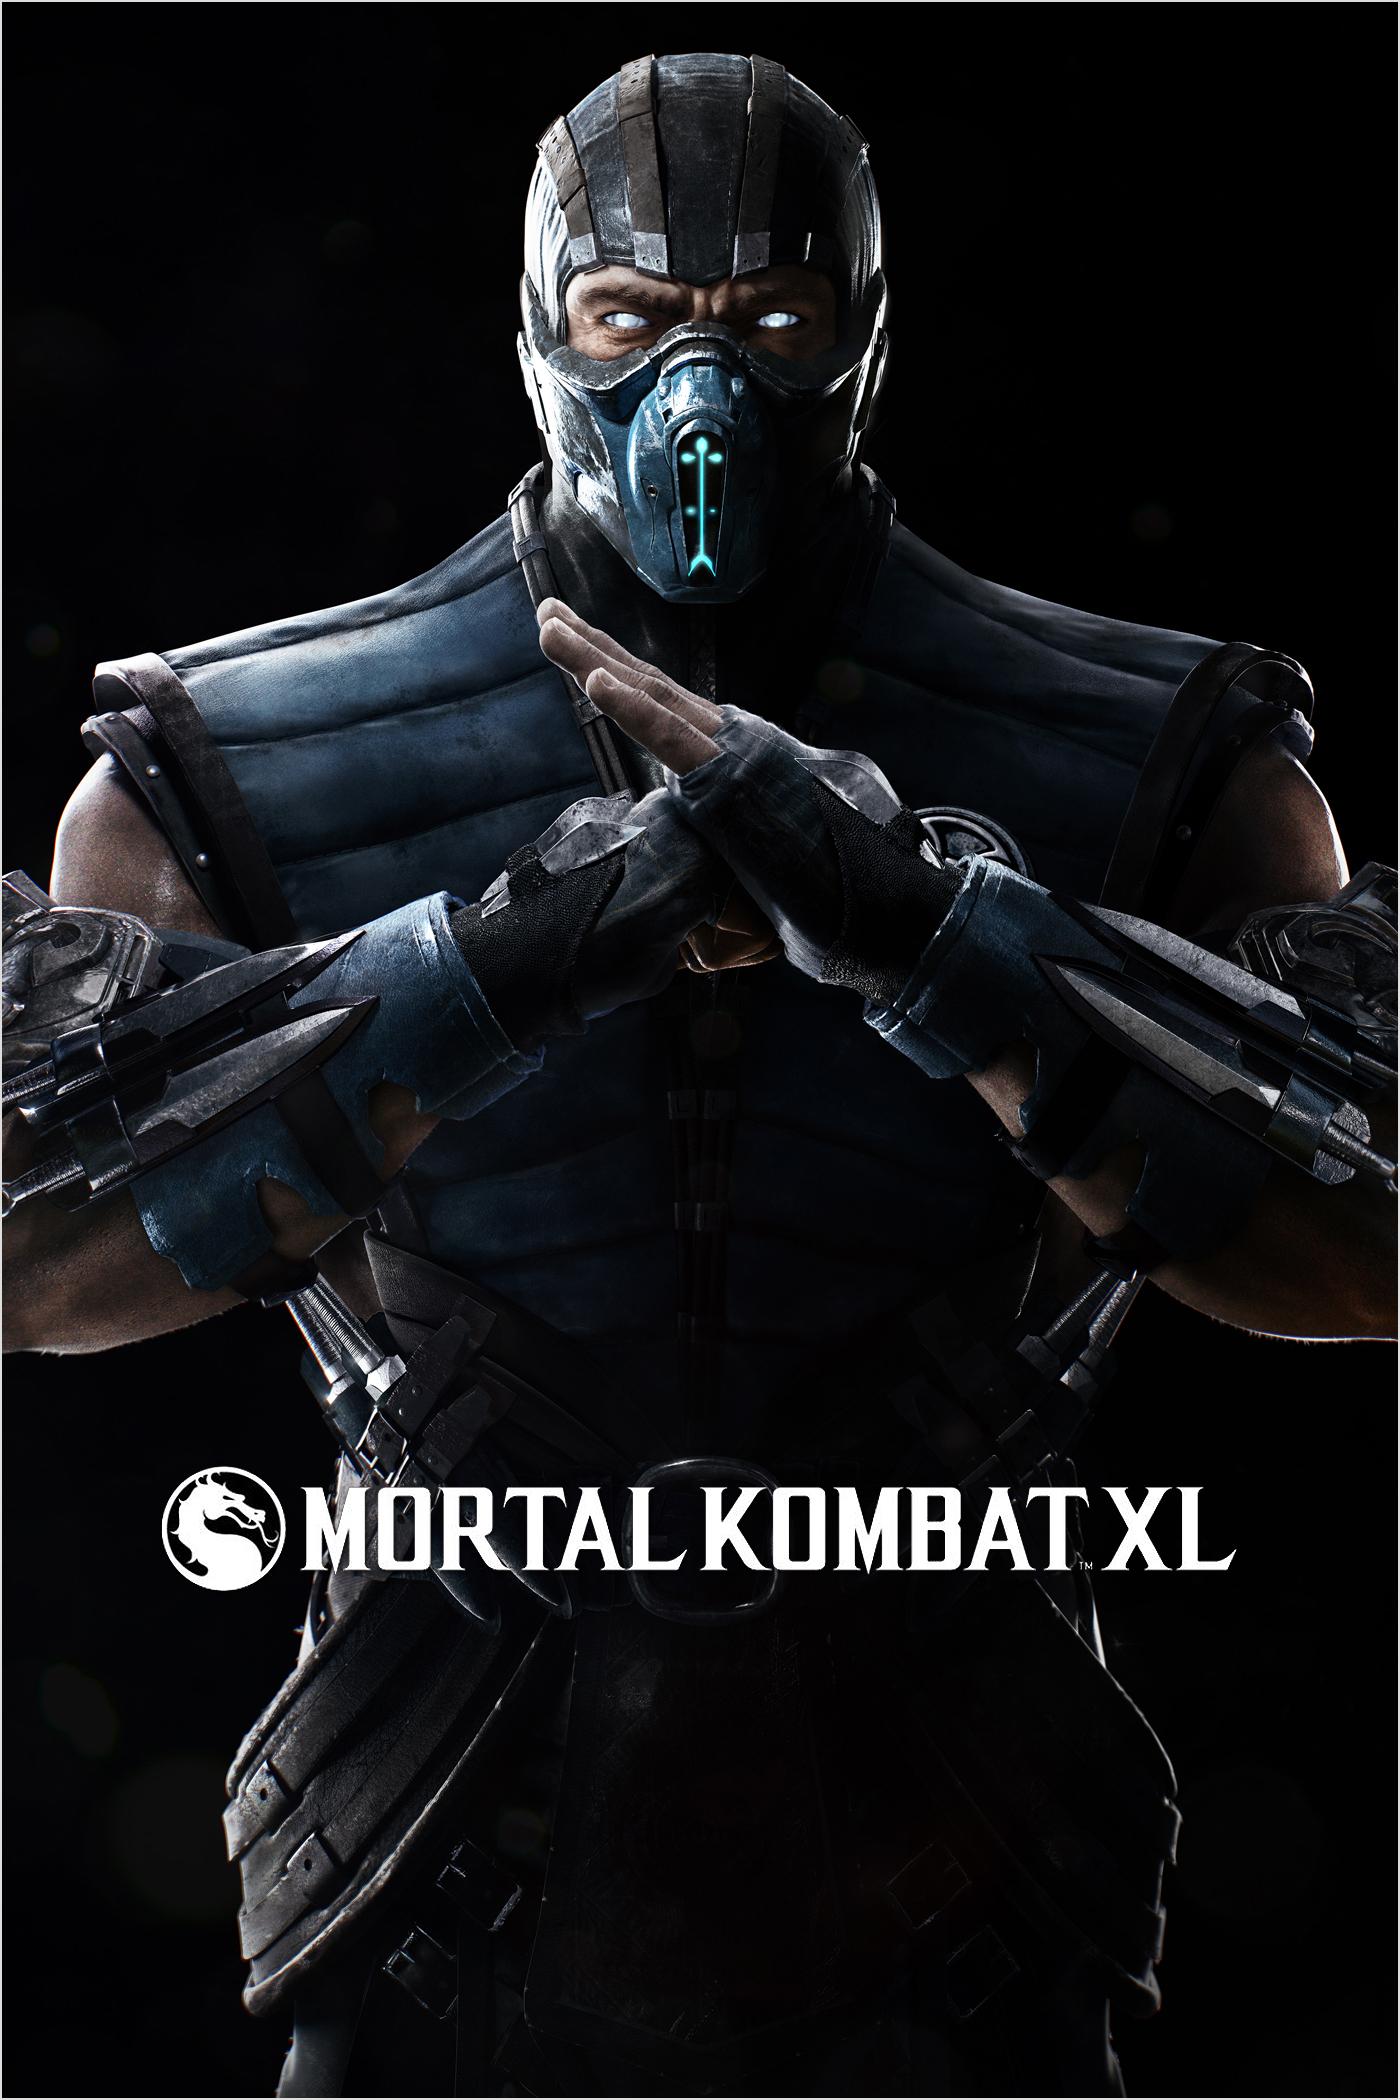 Mortal Kombat XL: Sub-Zero character with game logo